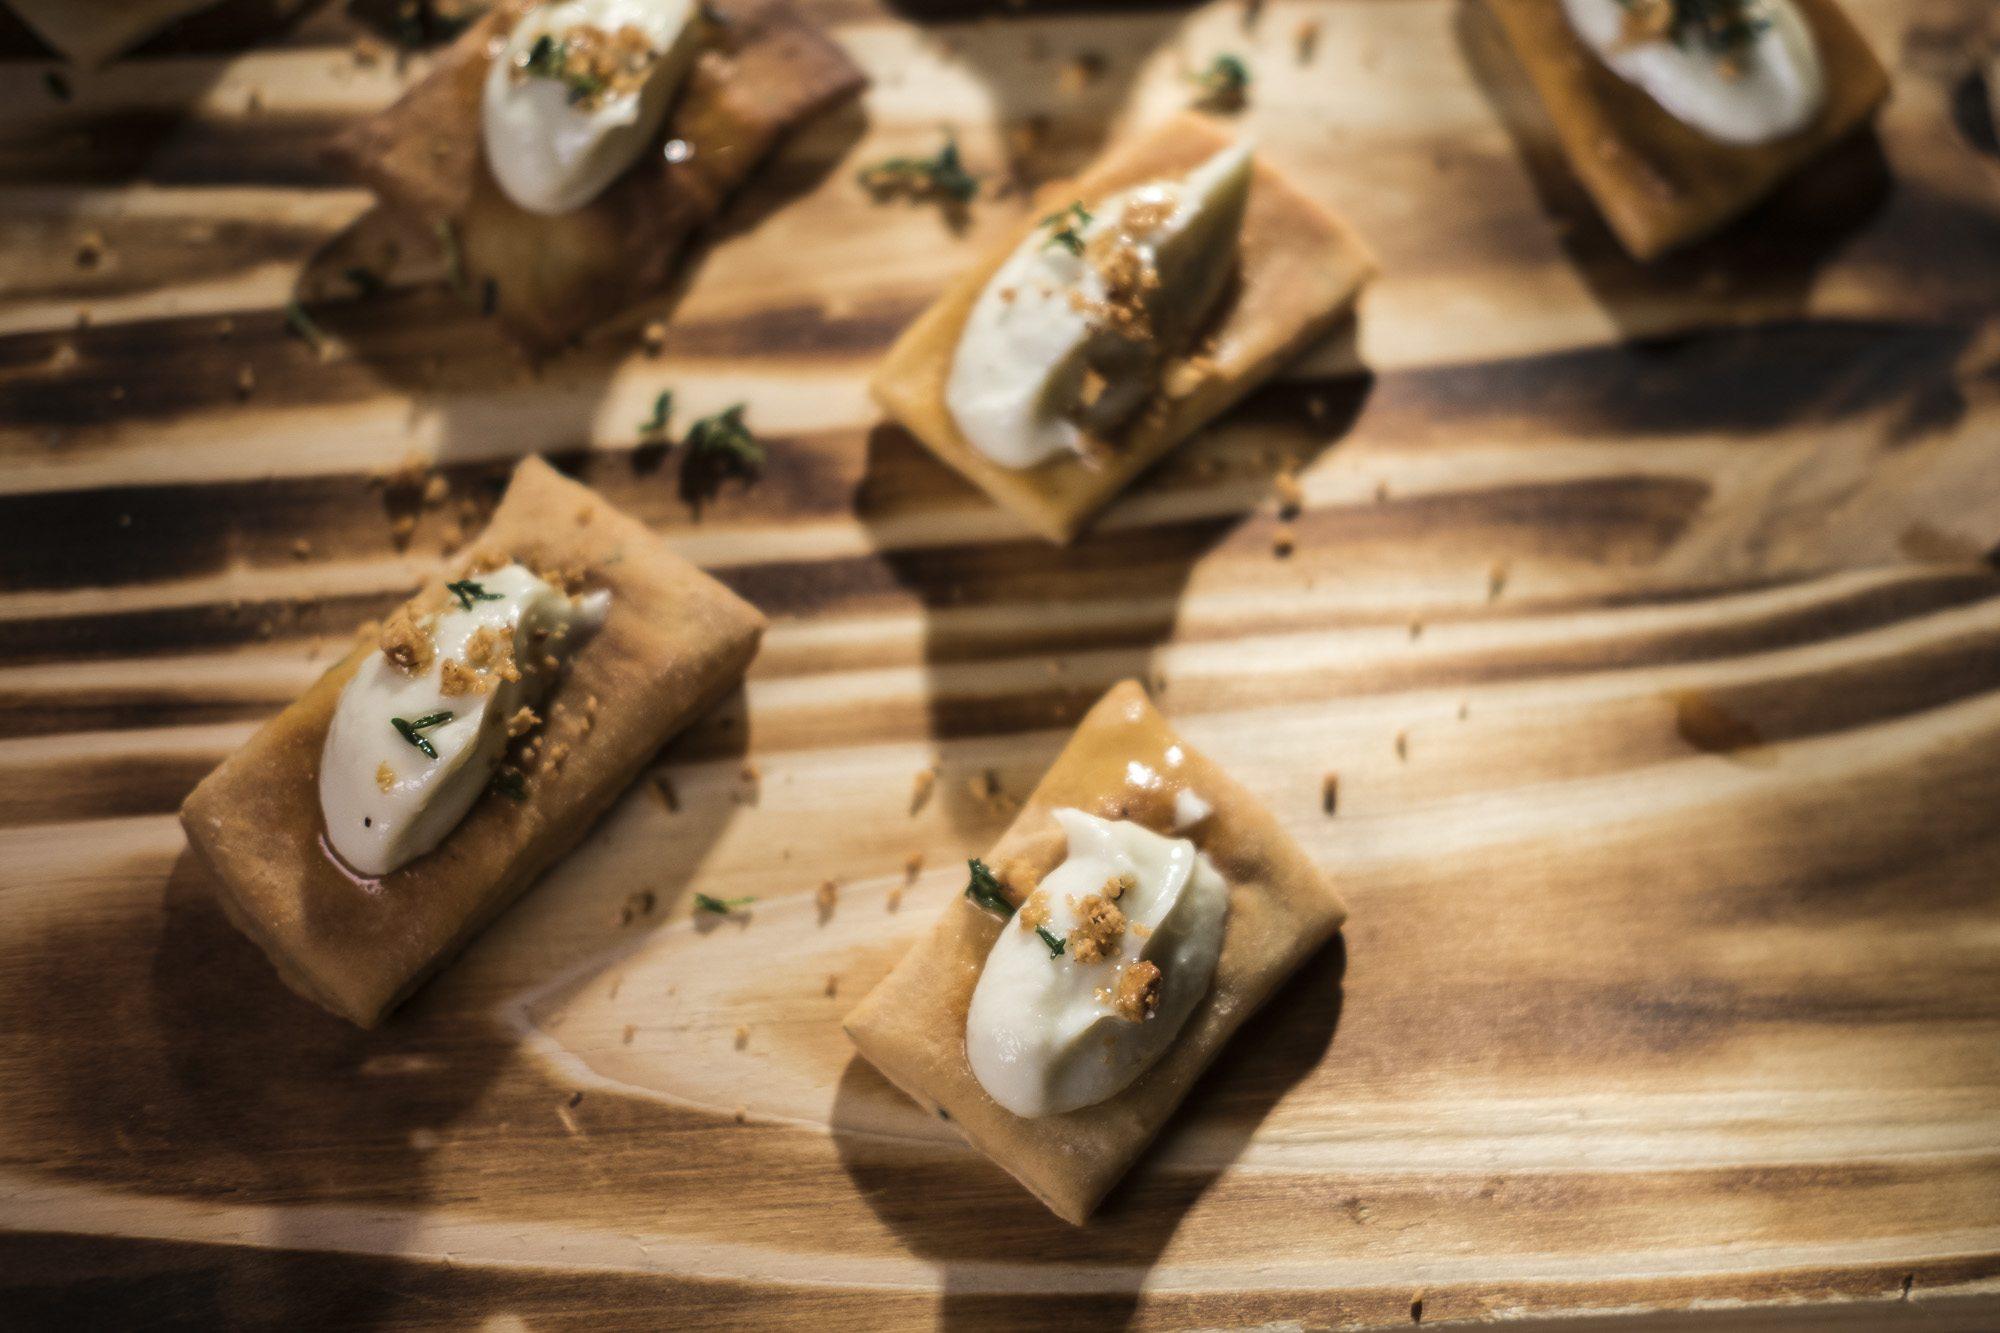 toronto-food-events-trashed-and-wasted-all-garbage-artscape-wychwood-barns-oliver-bonacini-mushroom